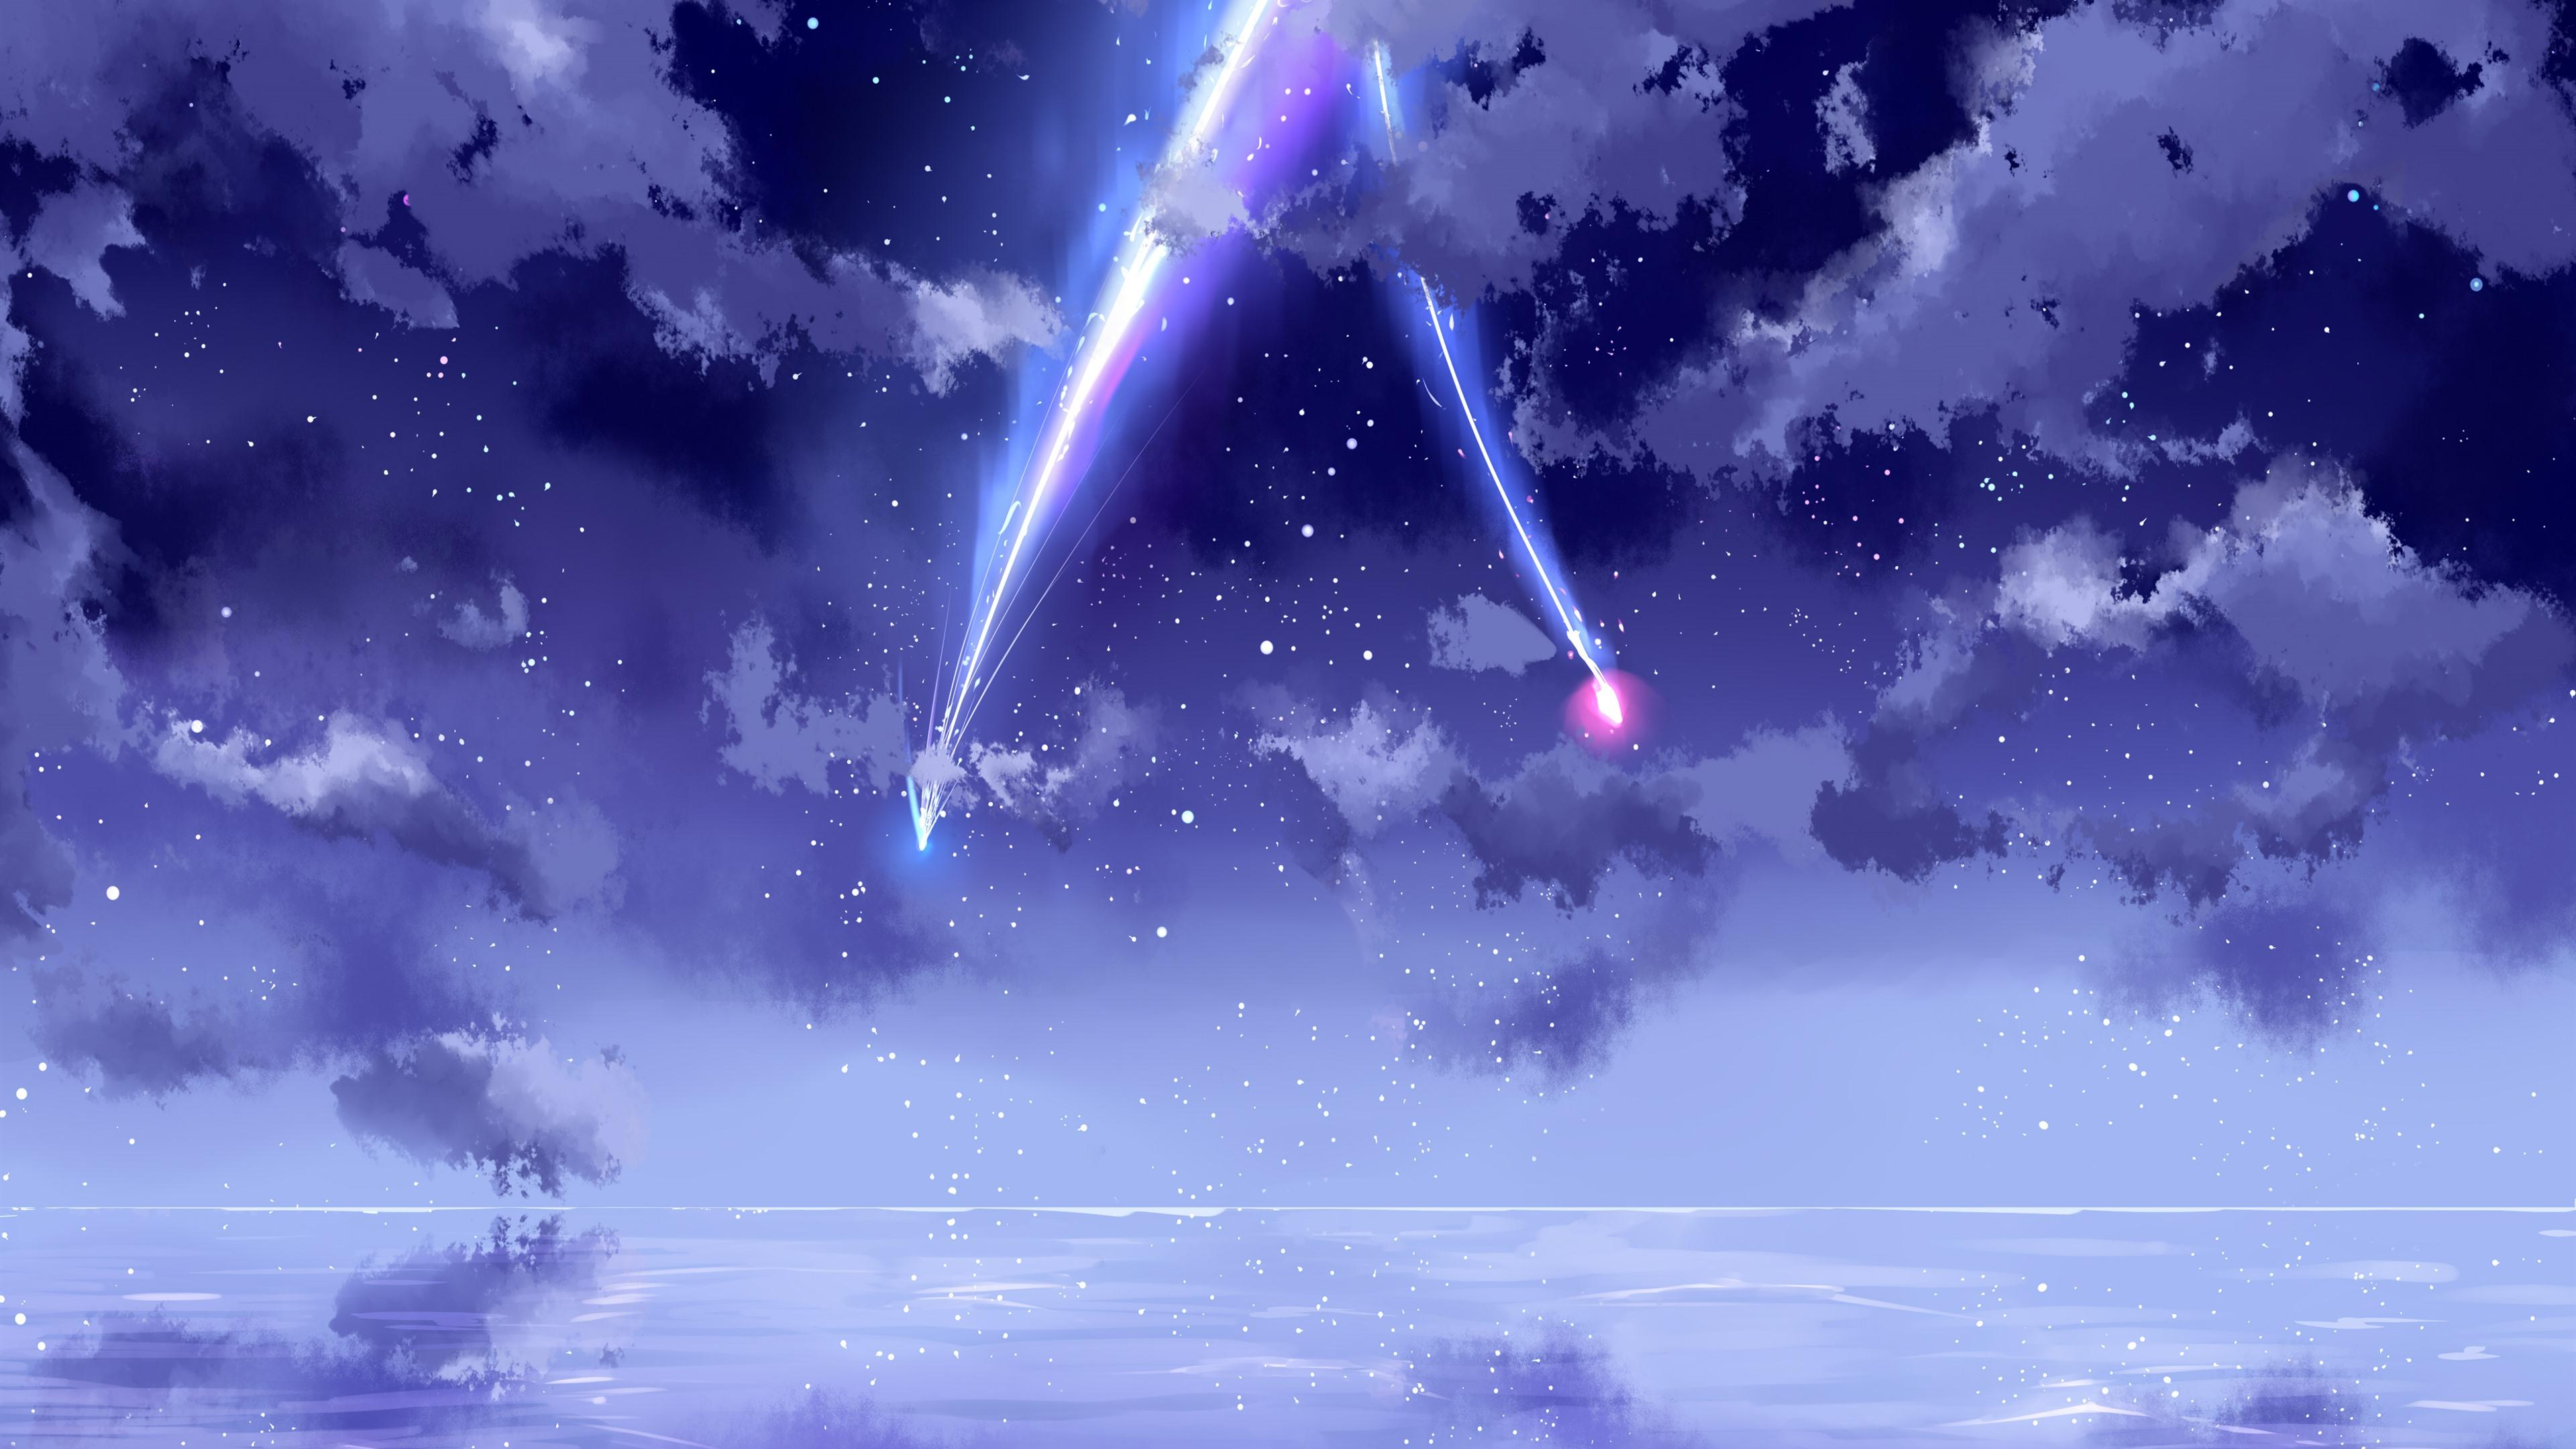 Purple Anime Sky Wallpapers Top Free Purple Anime Sky Backgrounds Wallpaperaccess